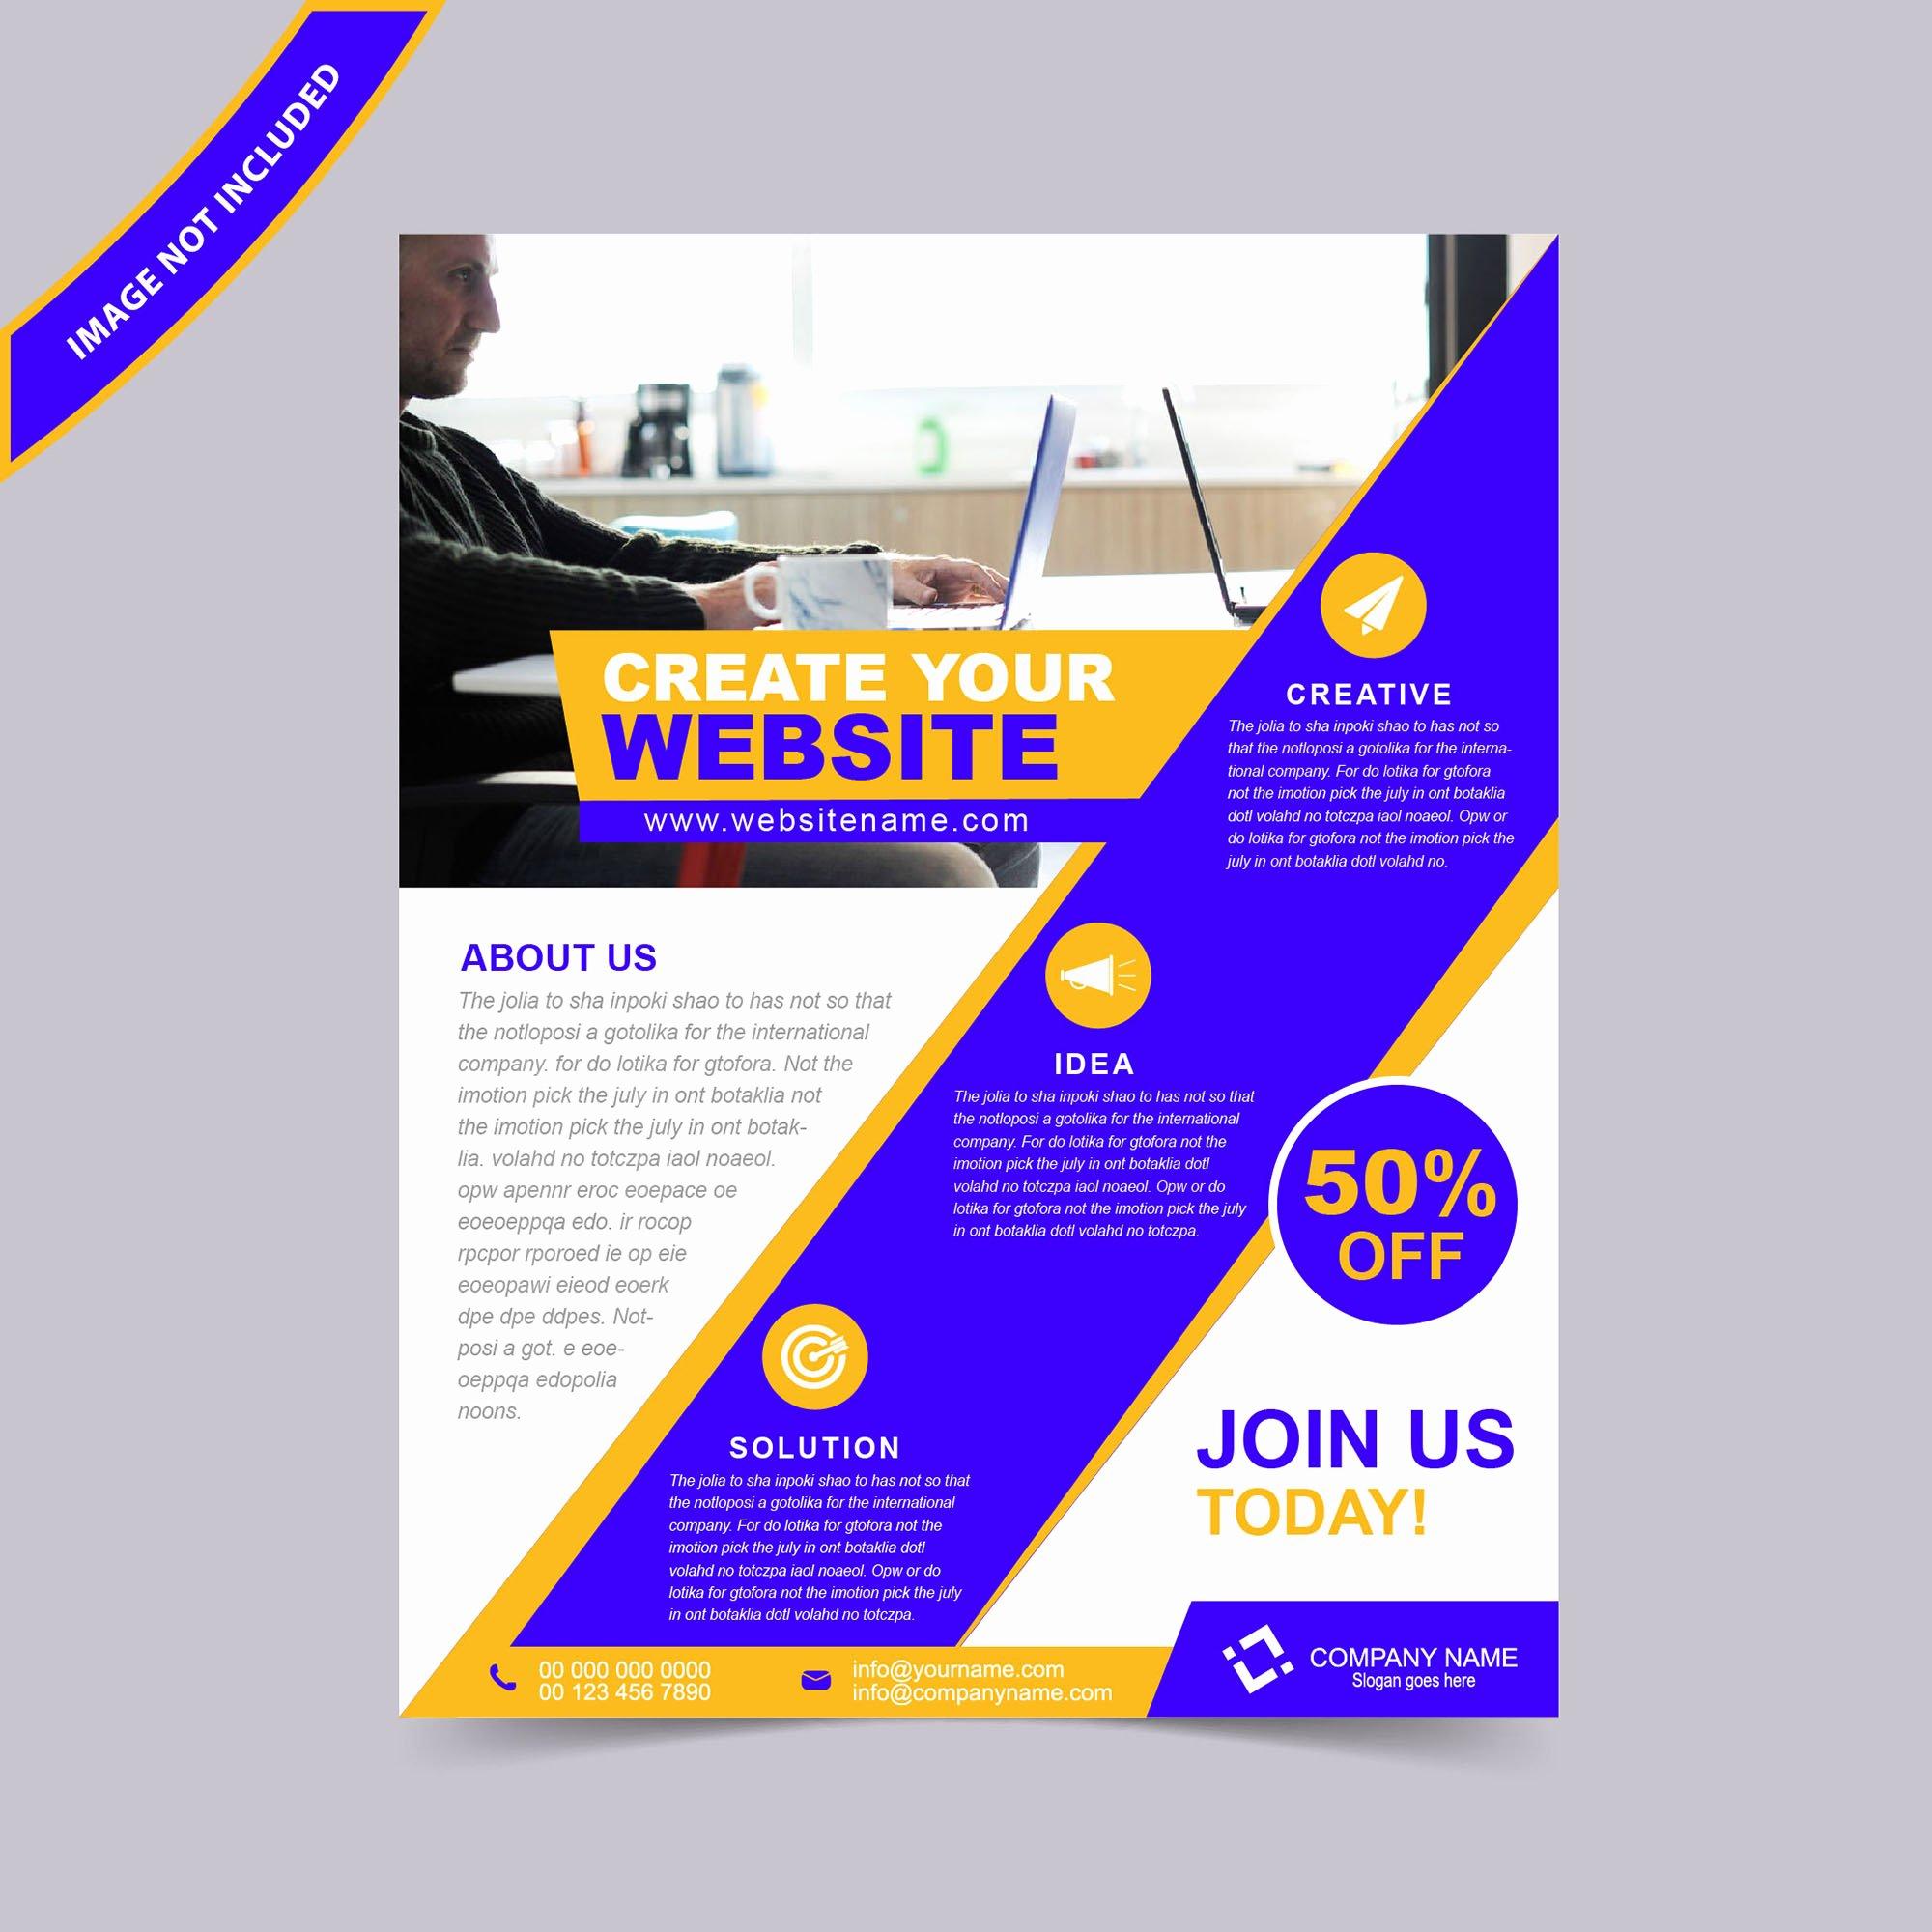 Web Design Flyer Template Free Yourweek 7d9f9feca25e